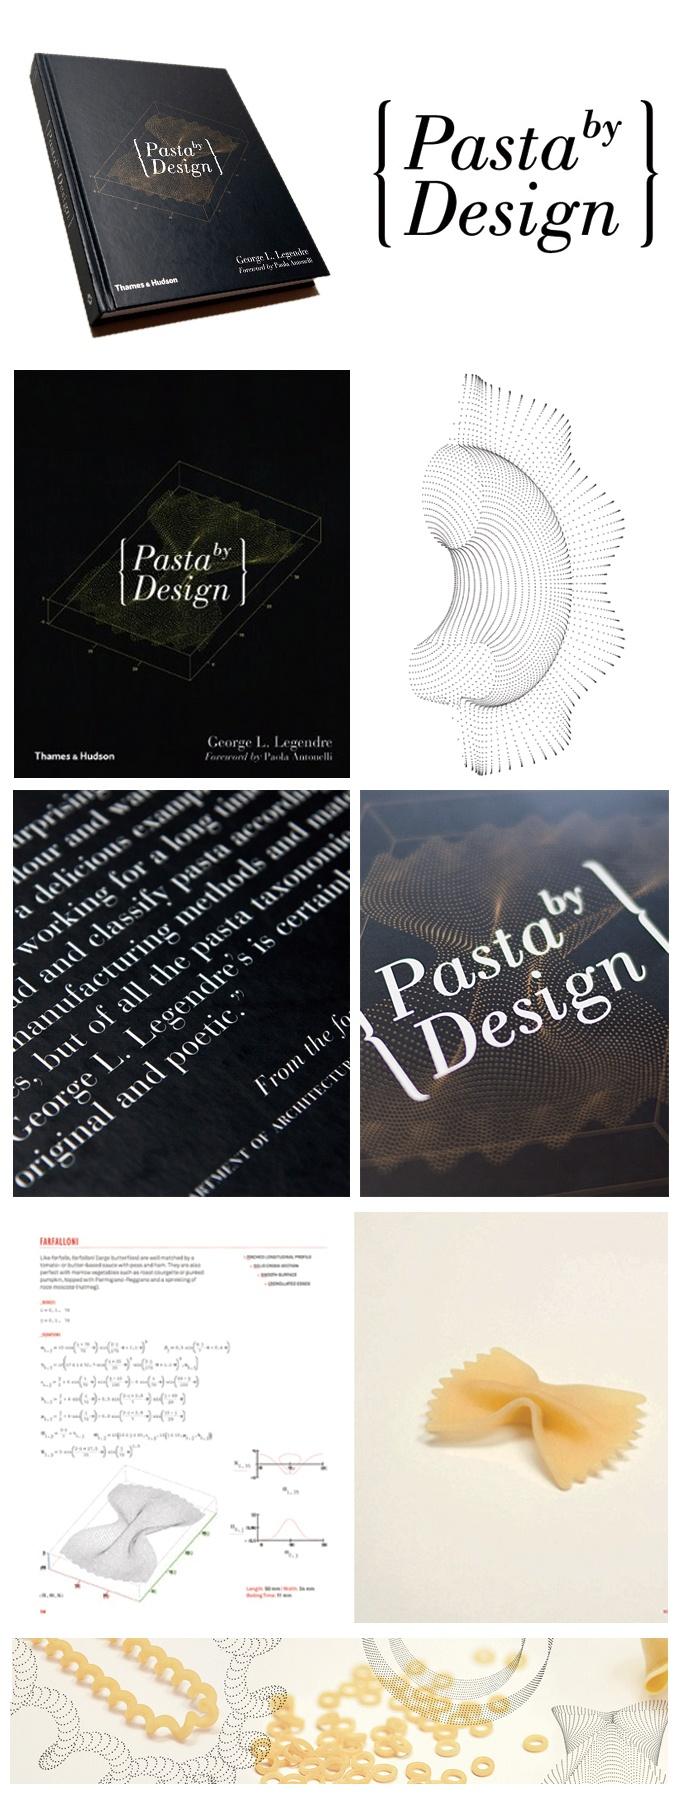 Pasta by Design:ARTIFACTS